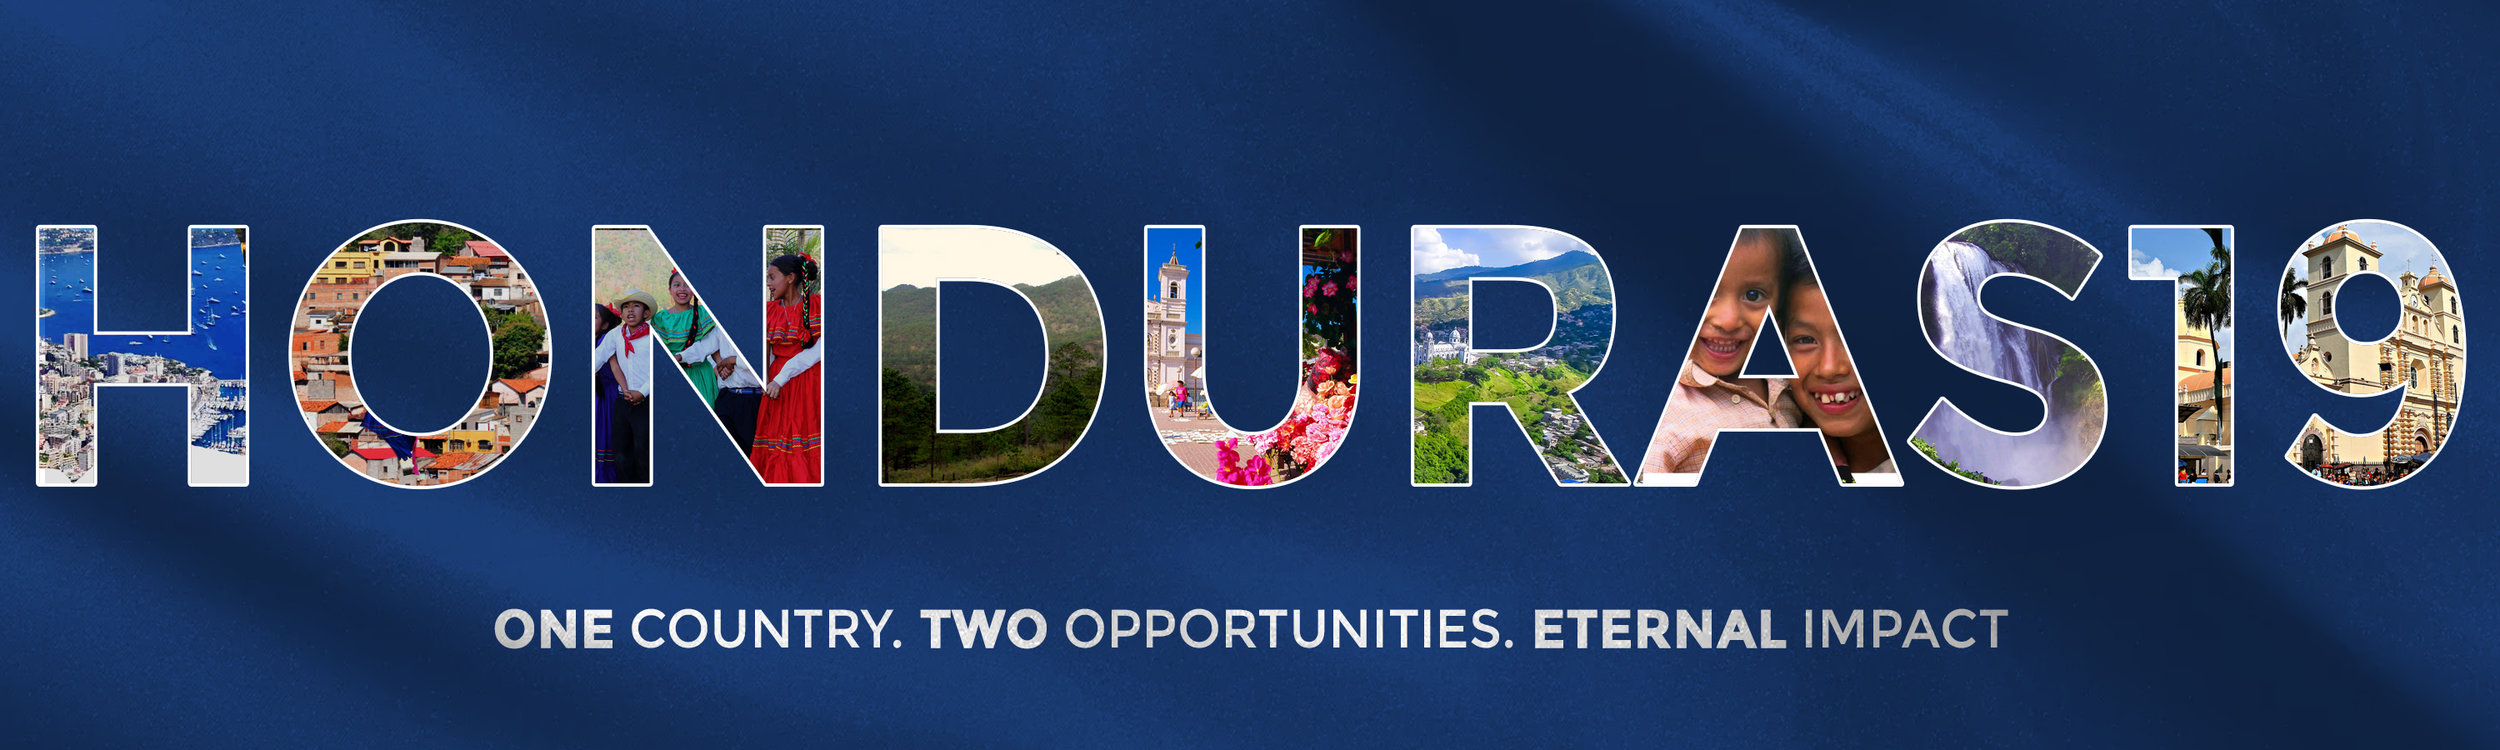 Honduras web banner.jpg